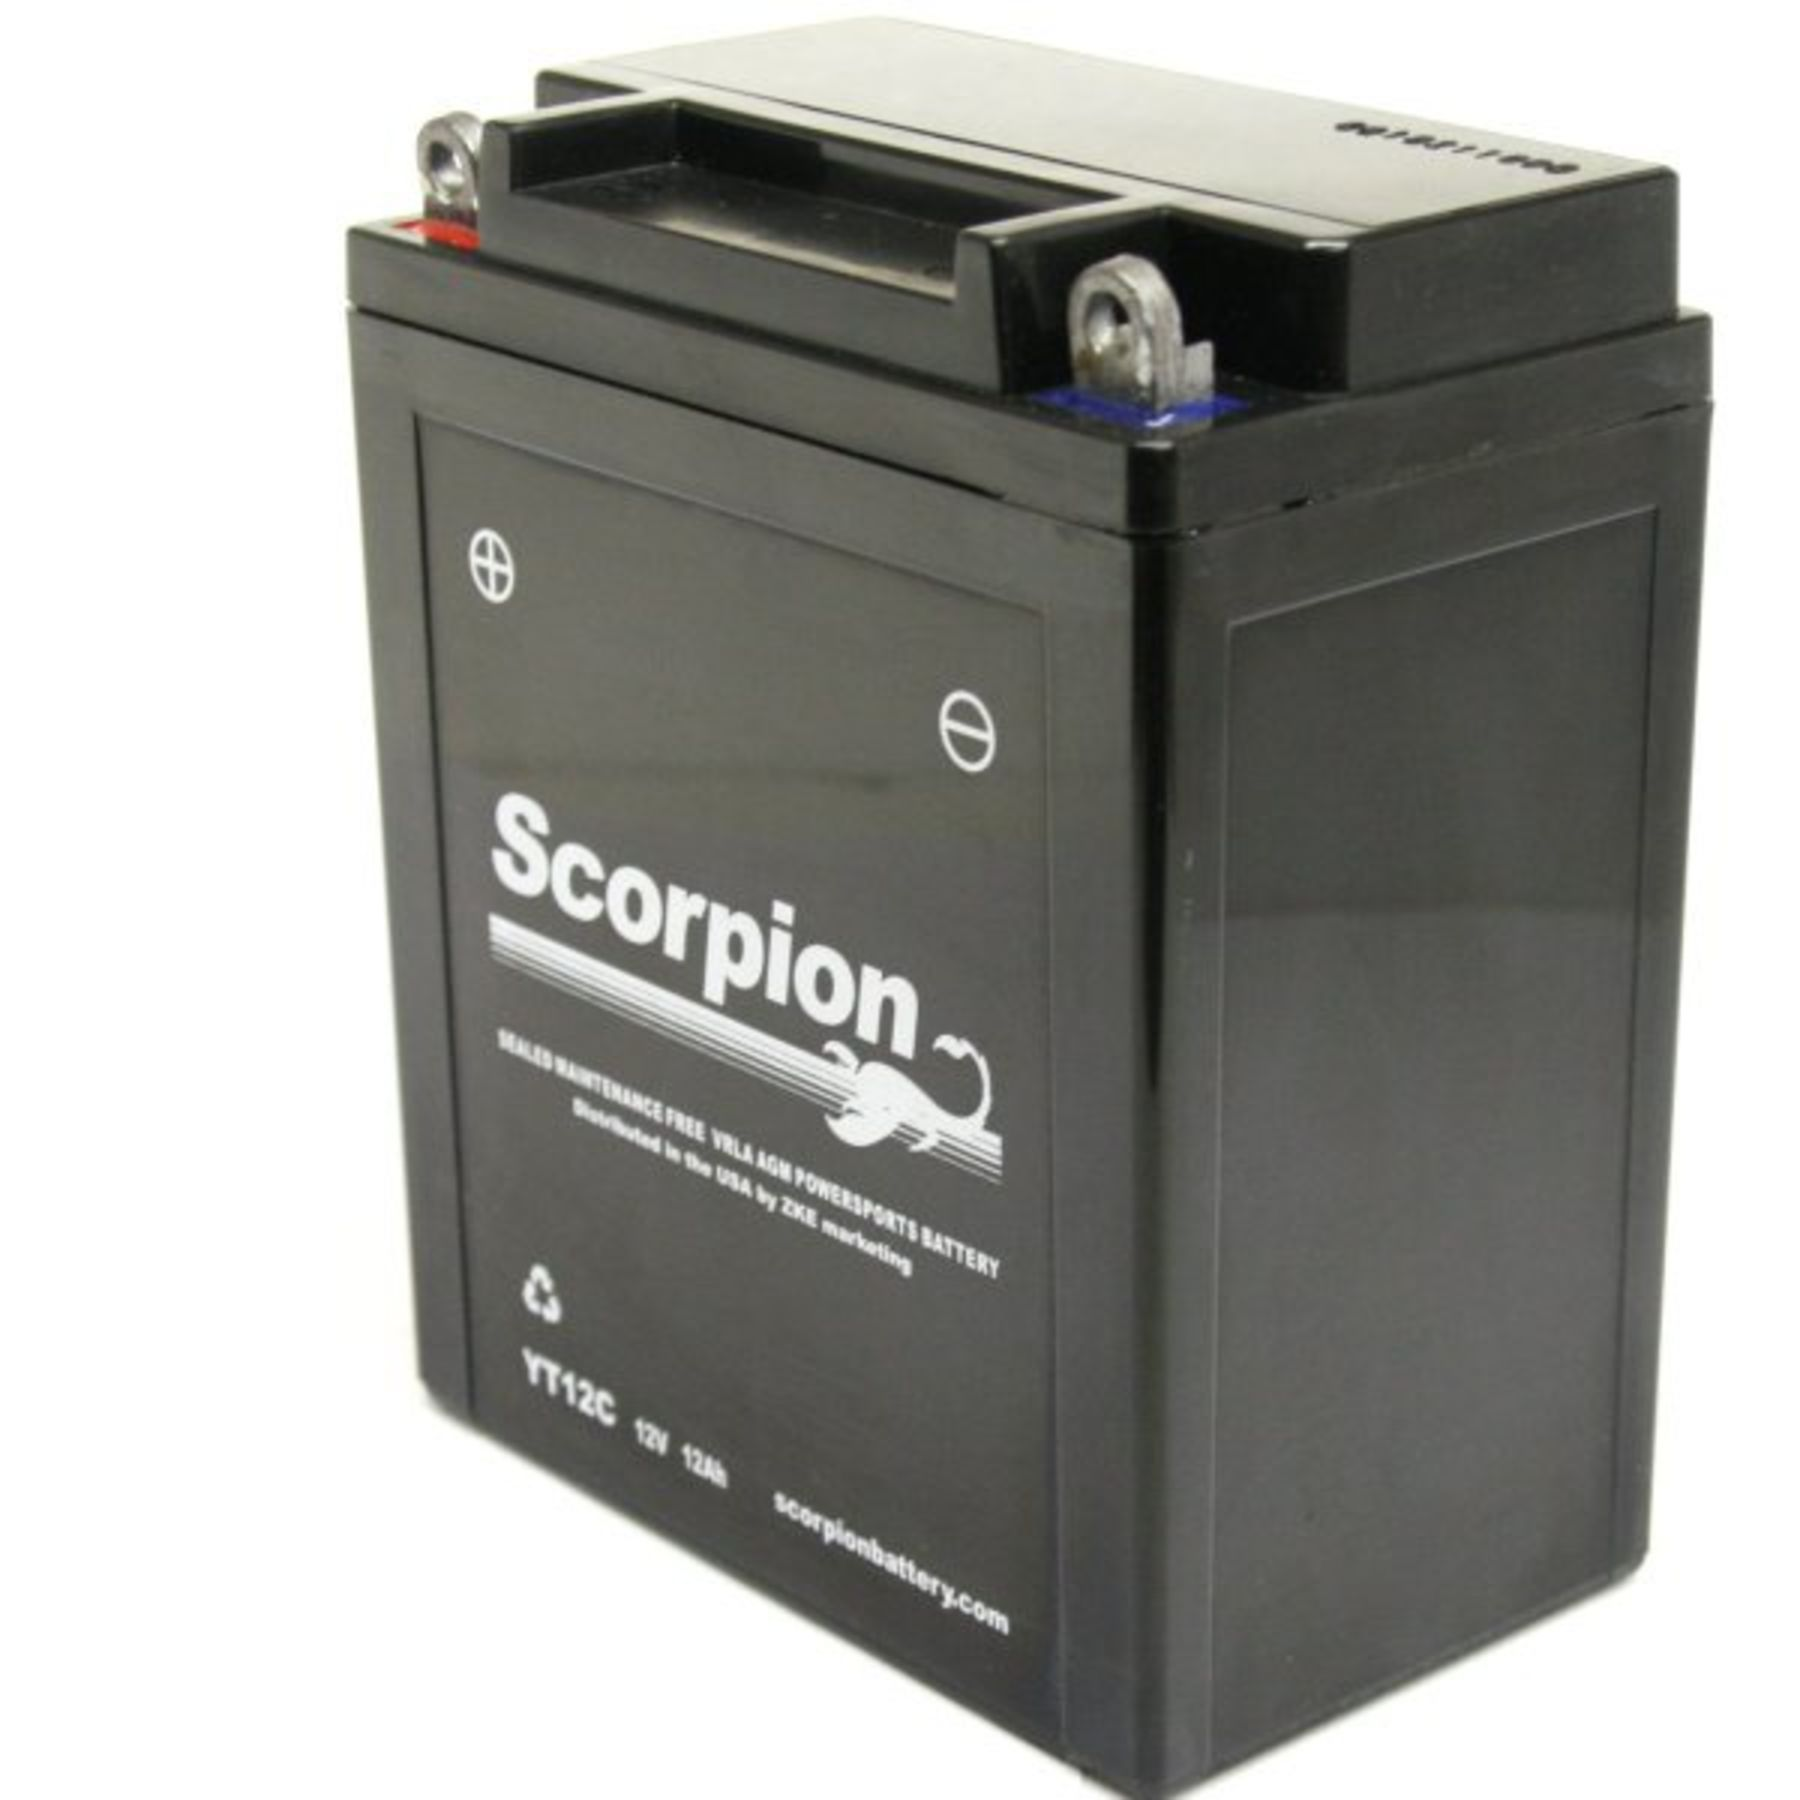 yt12c battery scorpion 12 volt motorcycle batteries. Black Bedroom Furniture Sets. Home Design Ideas